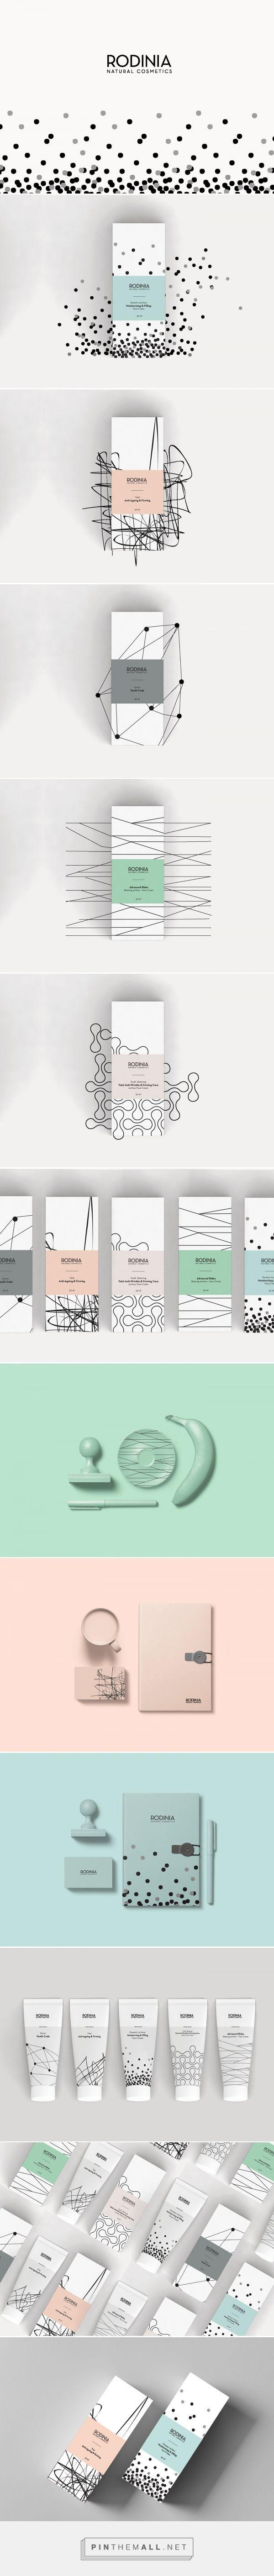 797 best Art/Graphic Design images on Pinterest | Urban intervention ...